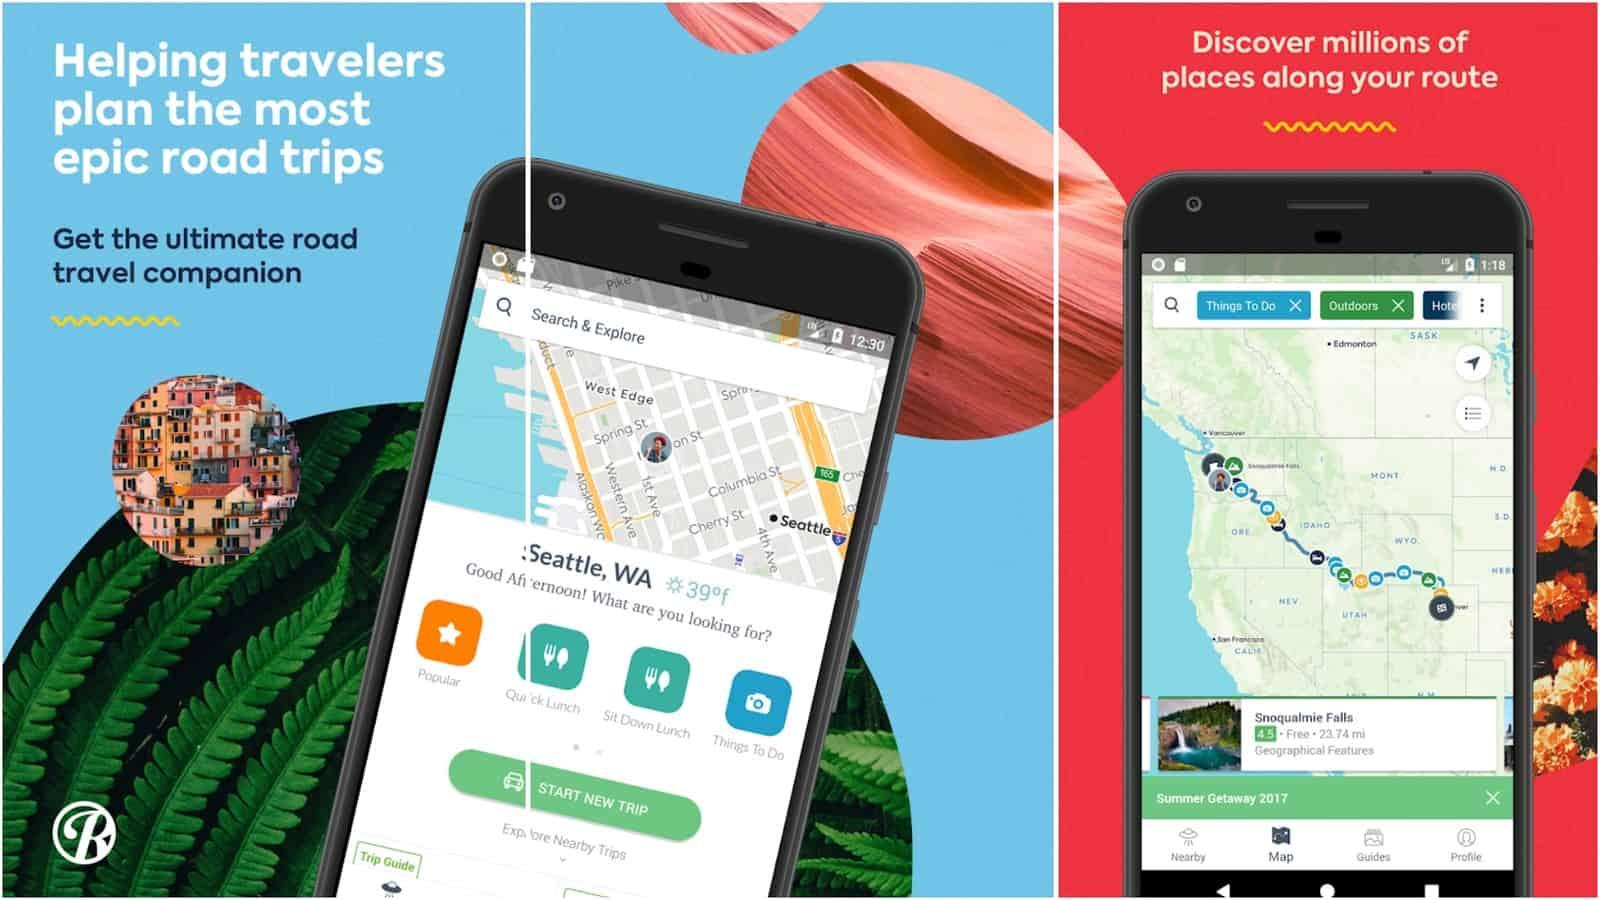 Roadtrippers app grid image